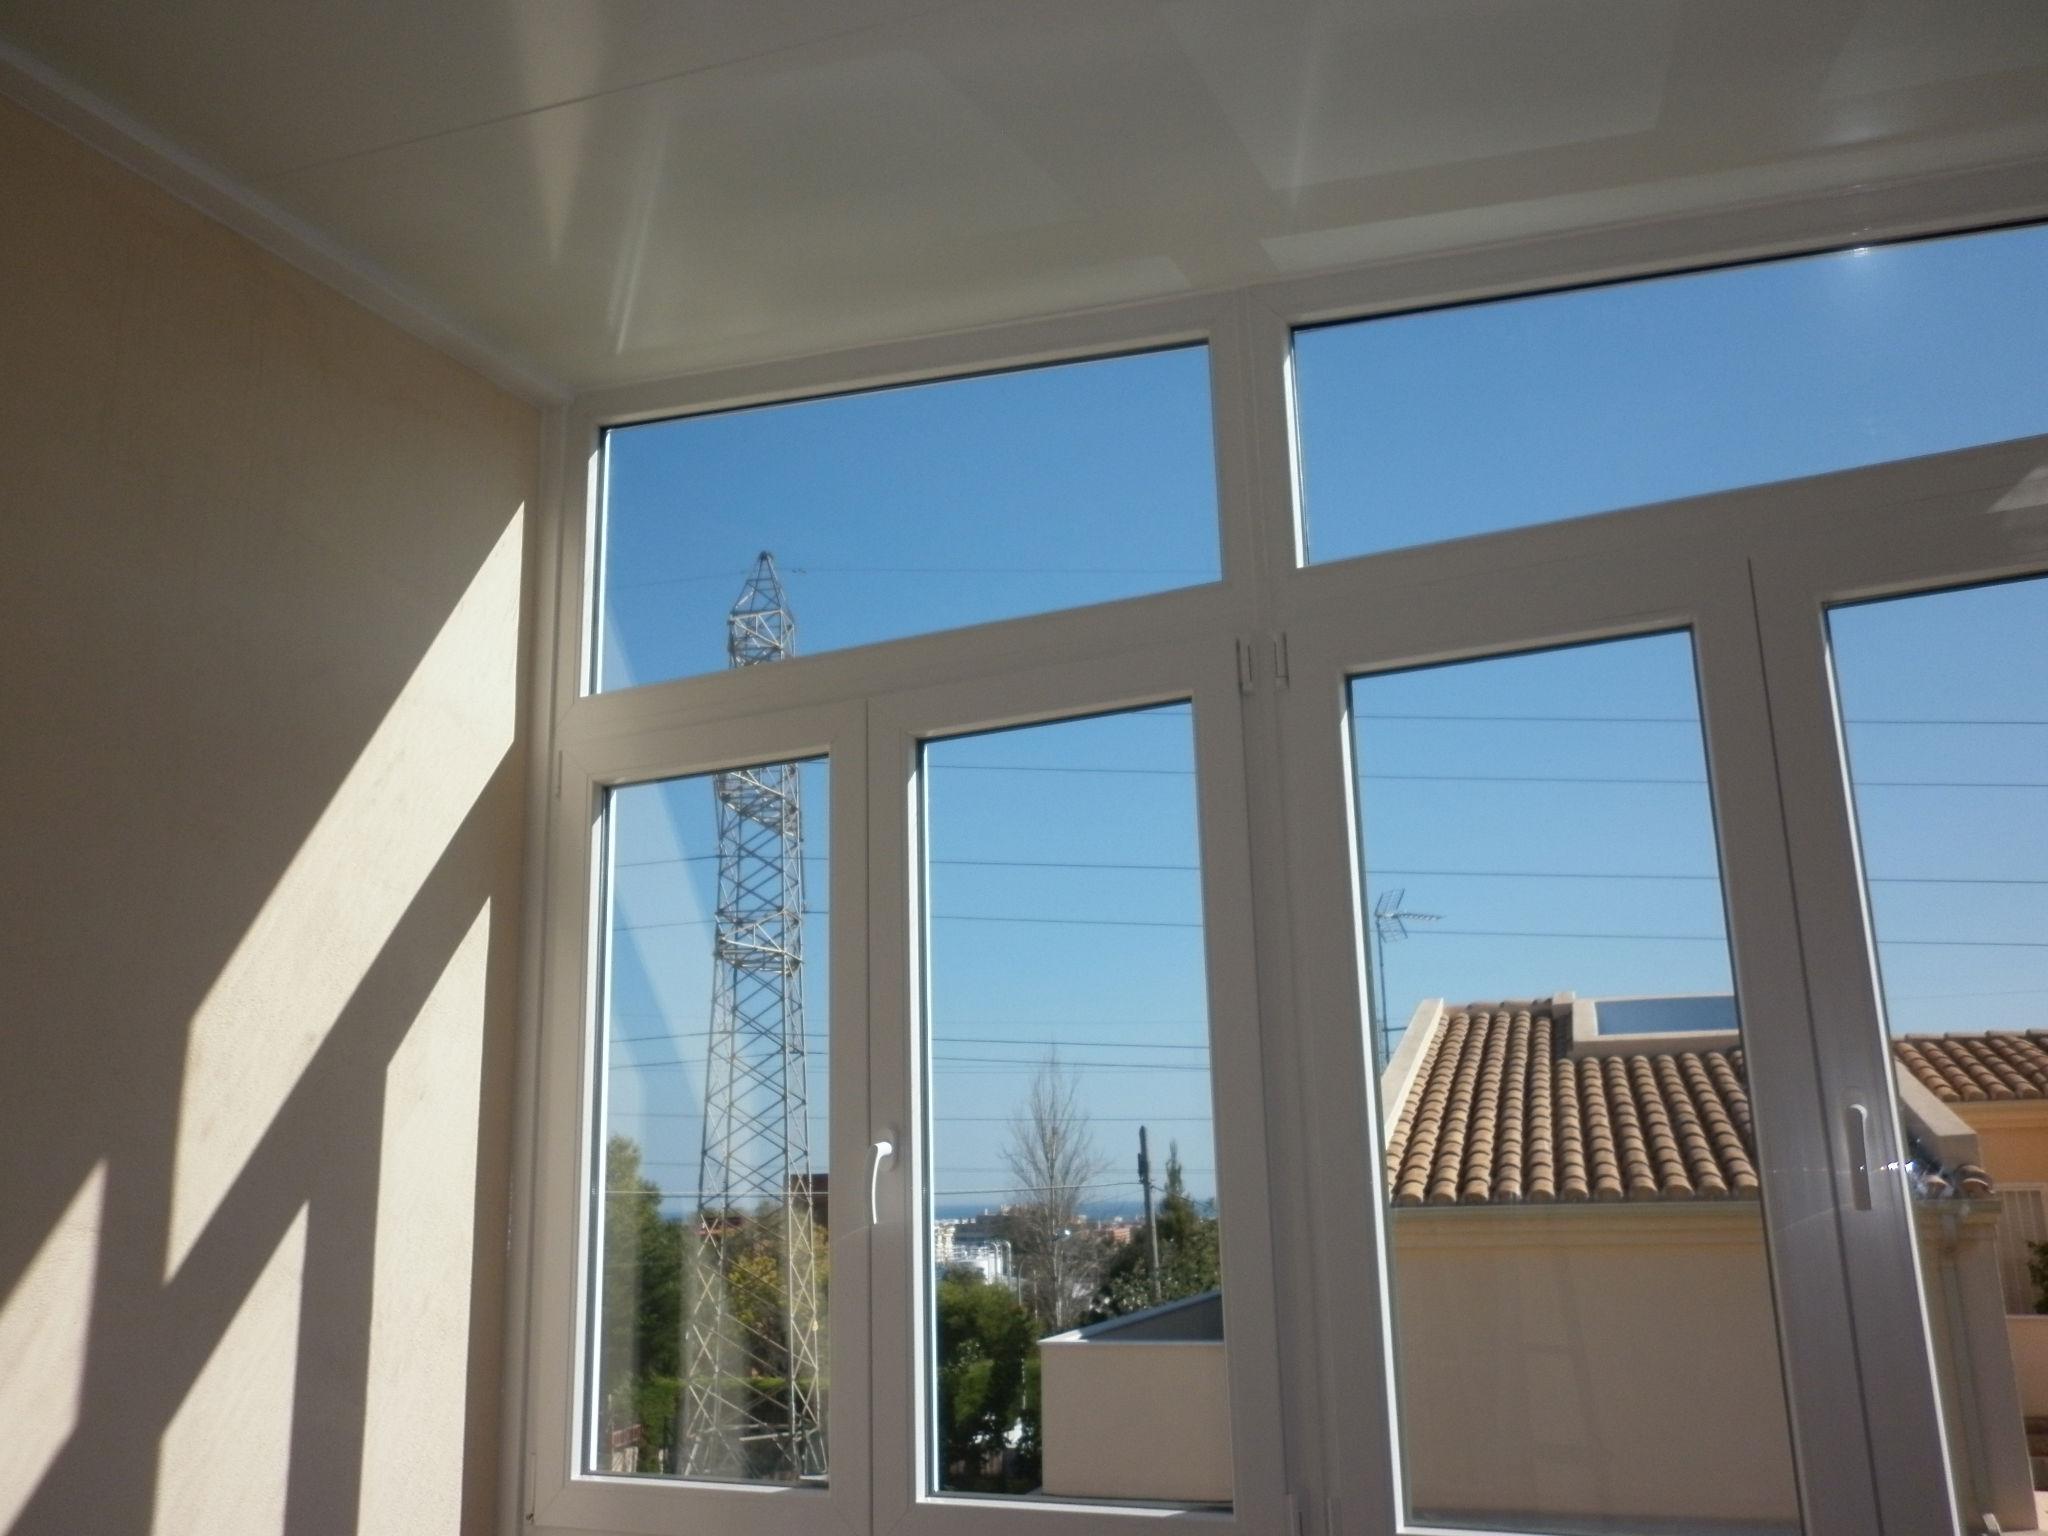 Foto 33 de Carpintería de aluminio, metálica y PVC en Málaga | Aluminios Alunoe